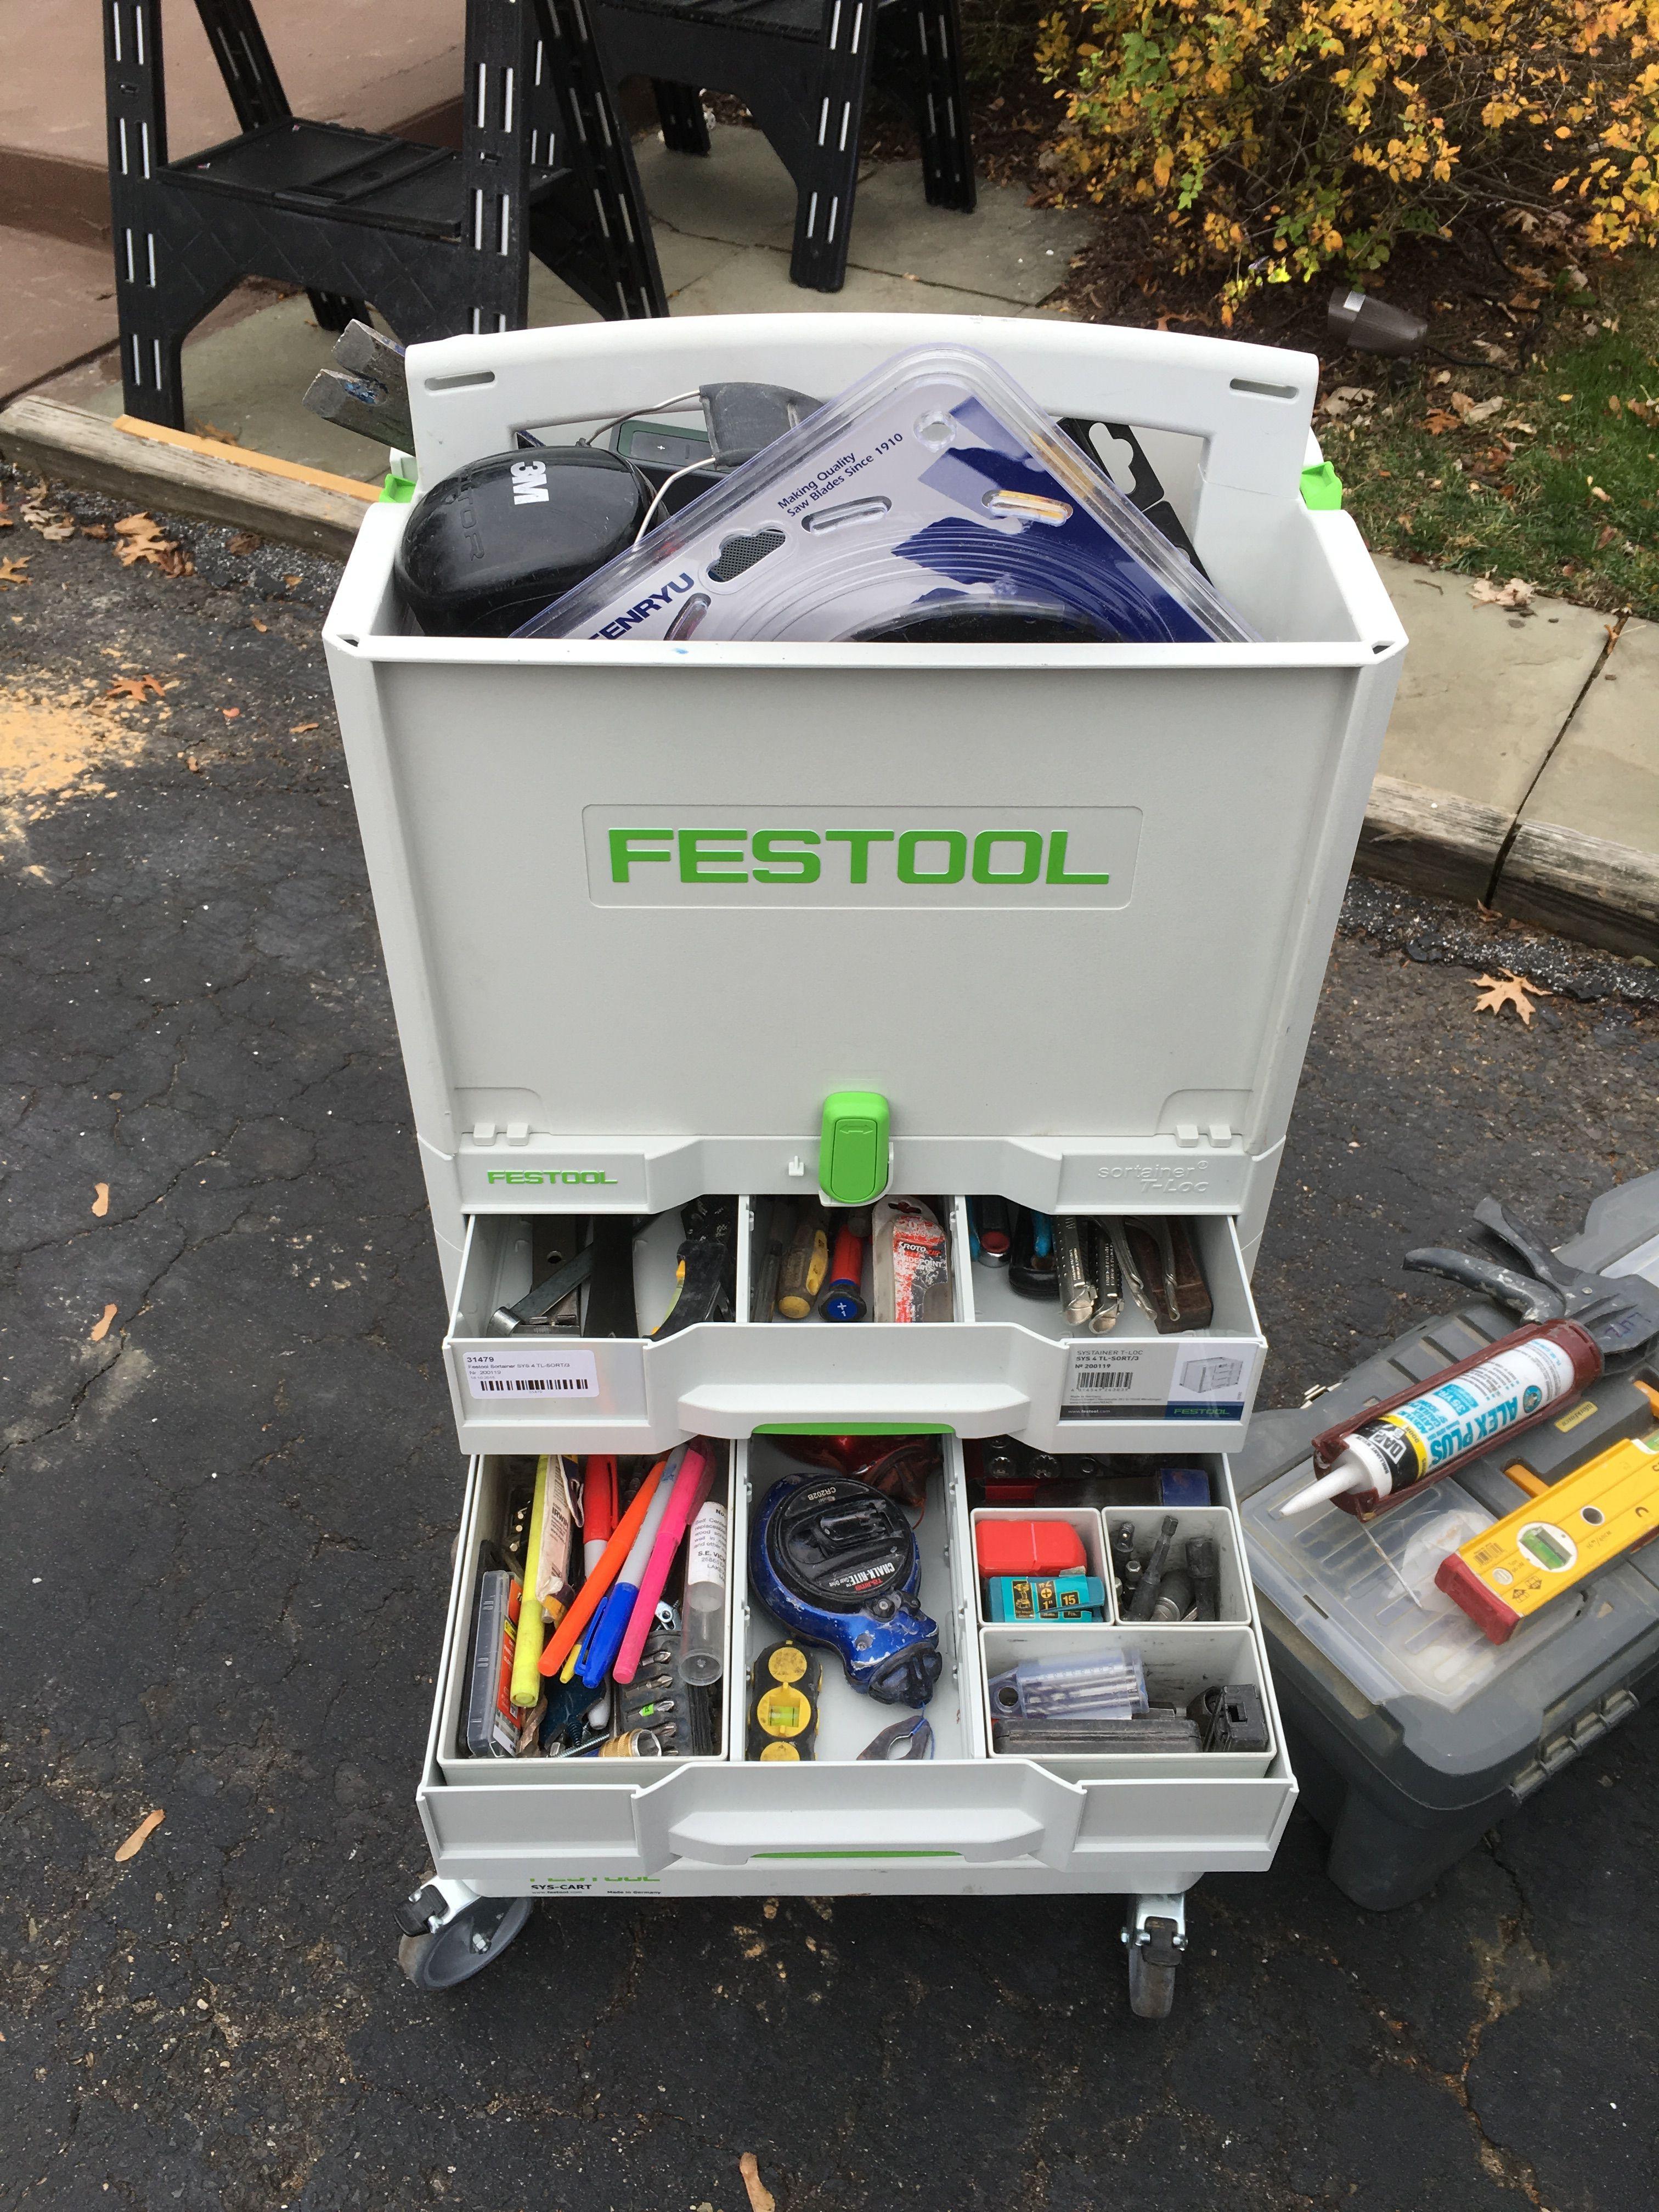 Sys 4 Tl Sort 3 Anyone Using For Hand Tools Festool Tools Tool Storage Diy Festool